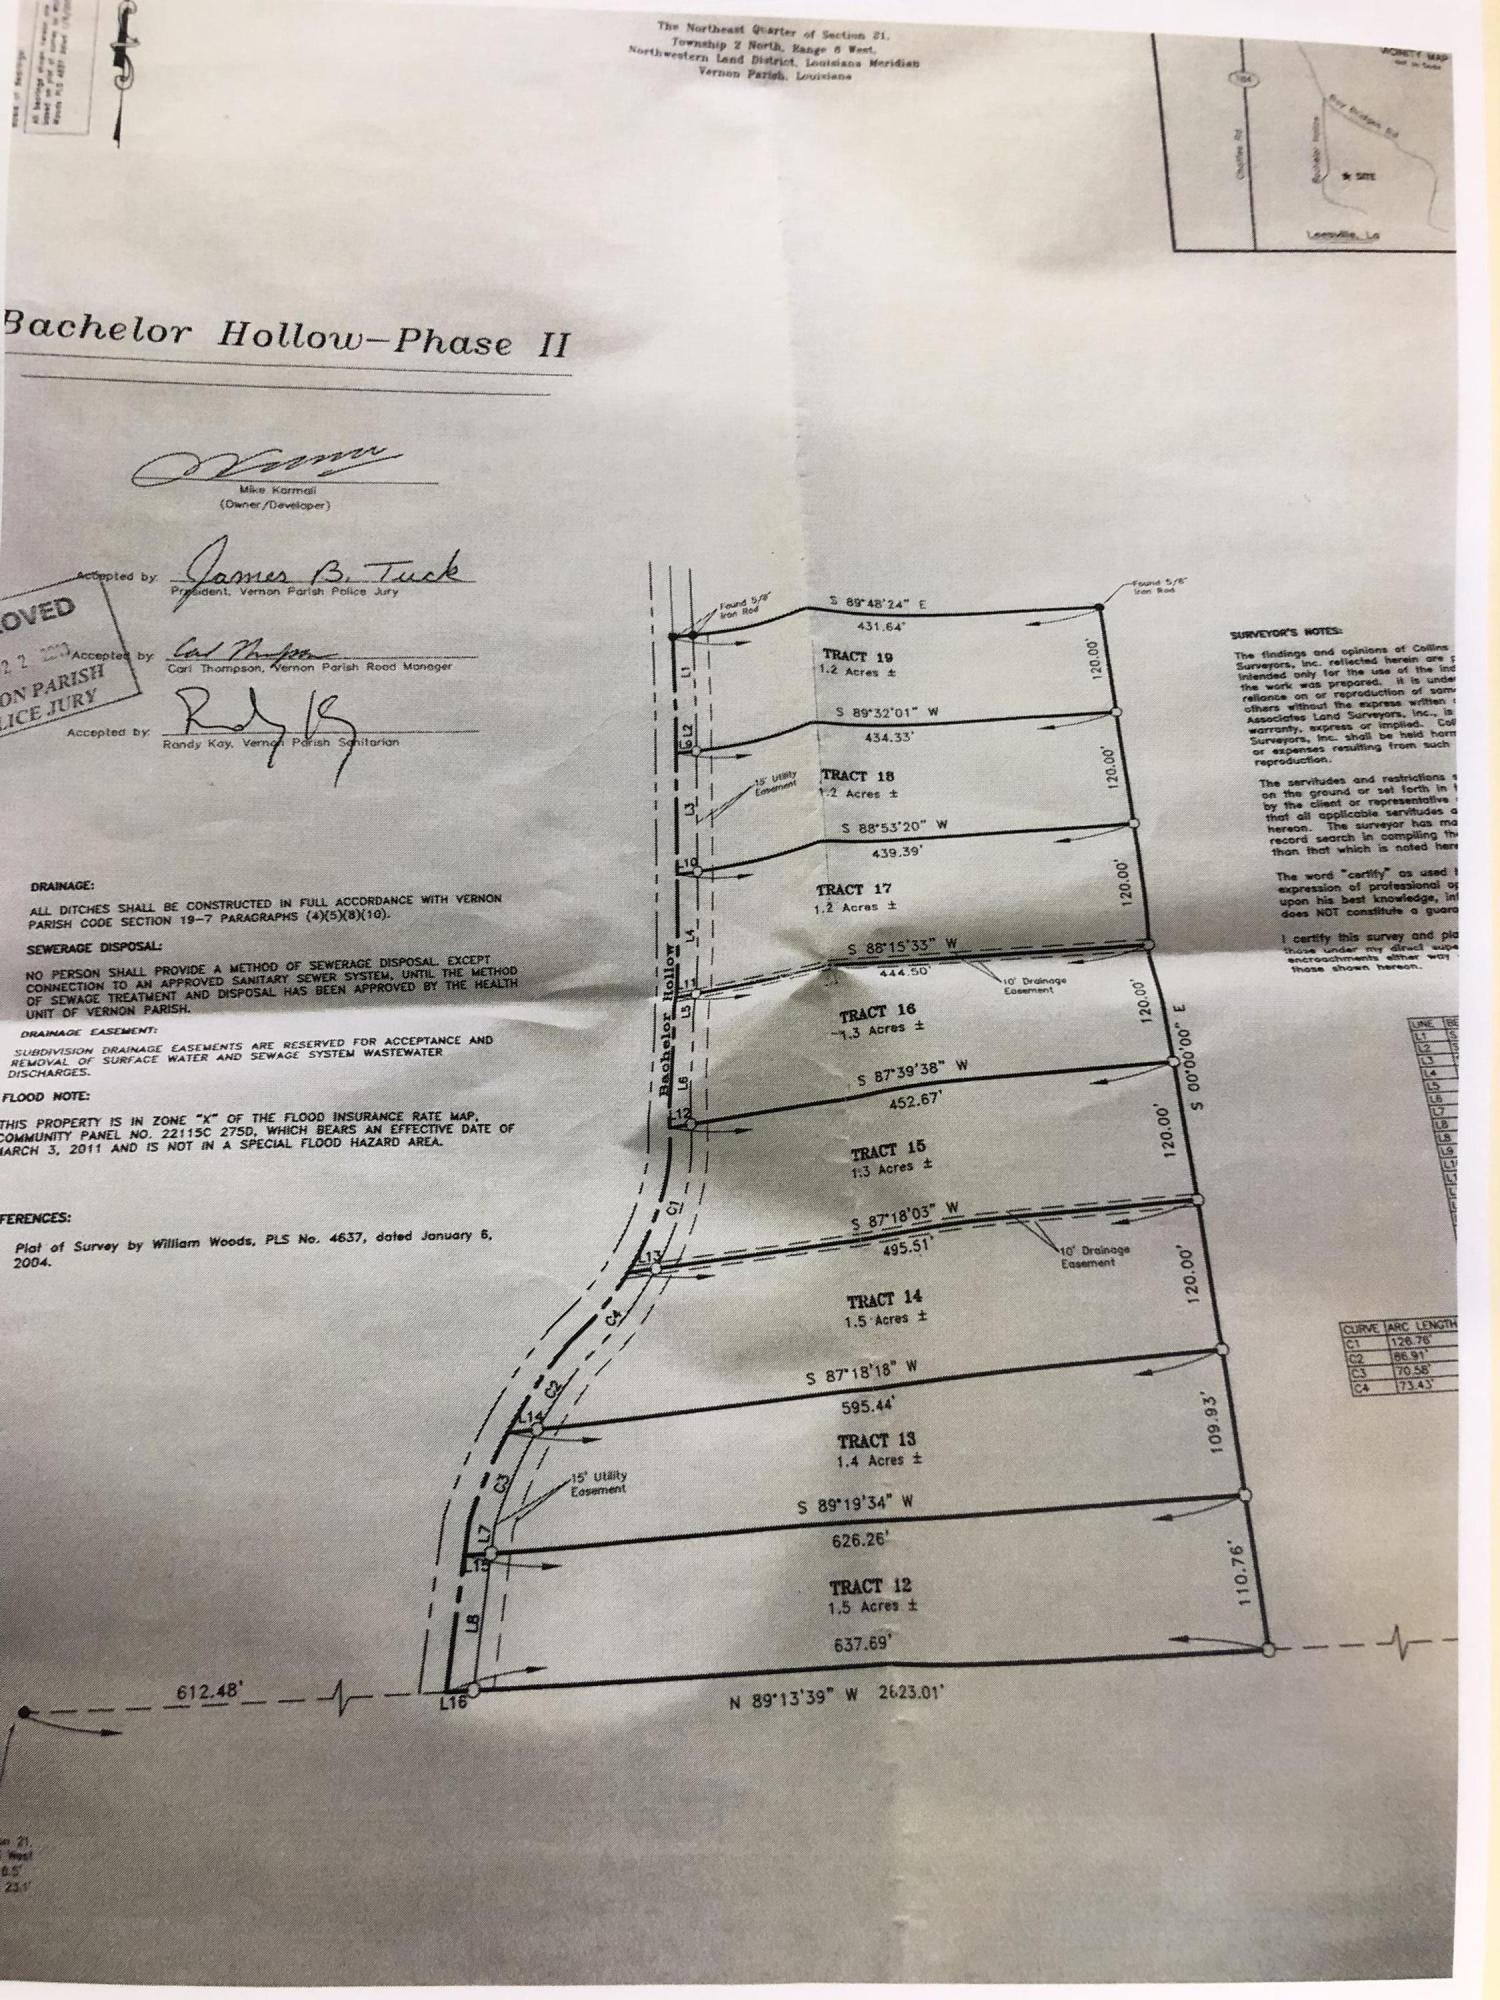 Leesville land for sale,  Bachelor Hollow Lot 19, Leesville LA - $18,900